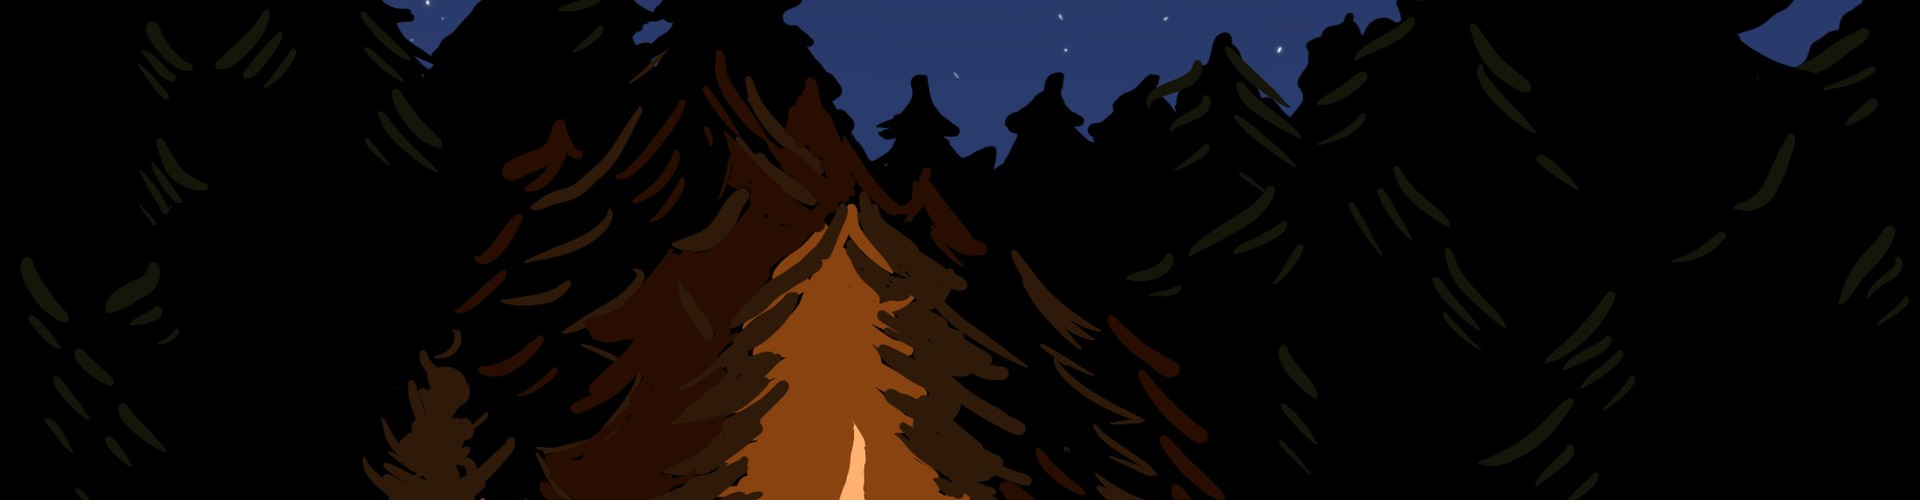 BG Campfire image.jpeg